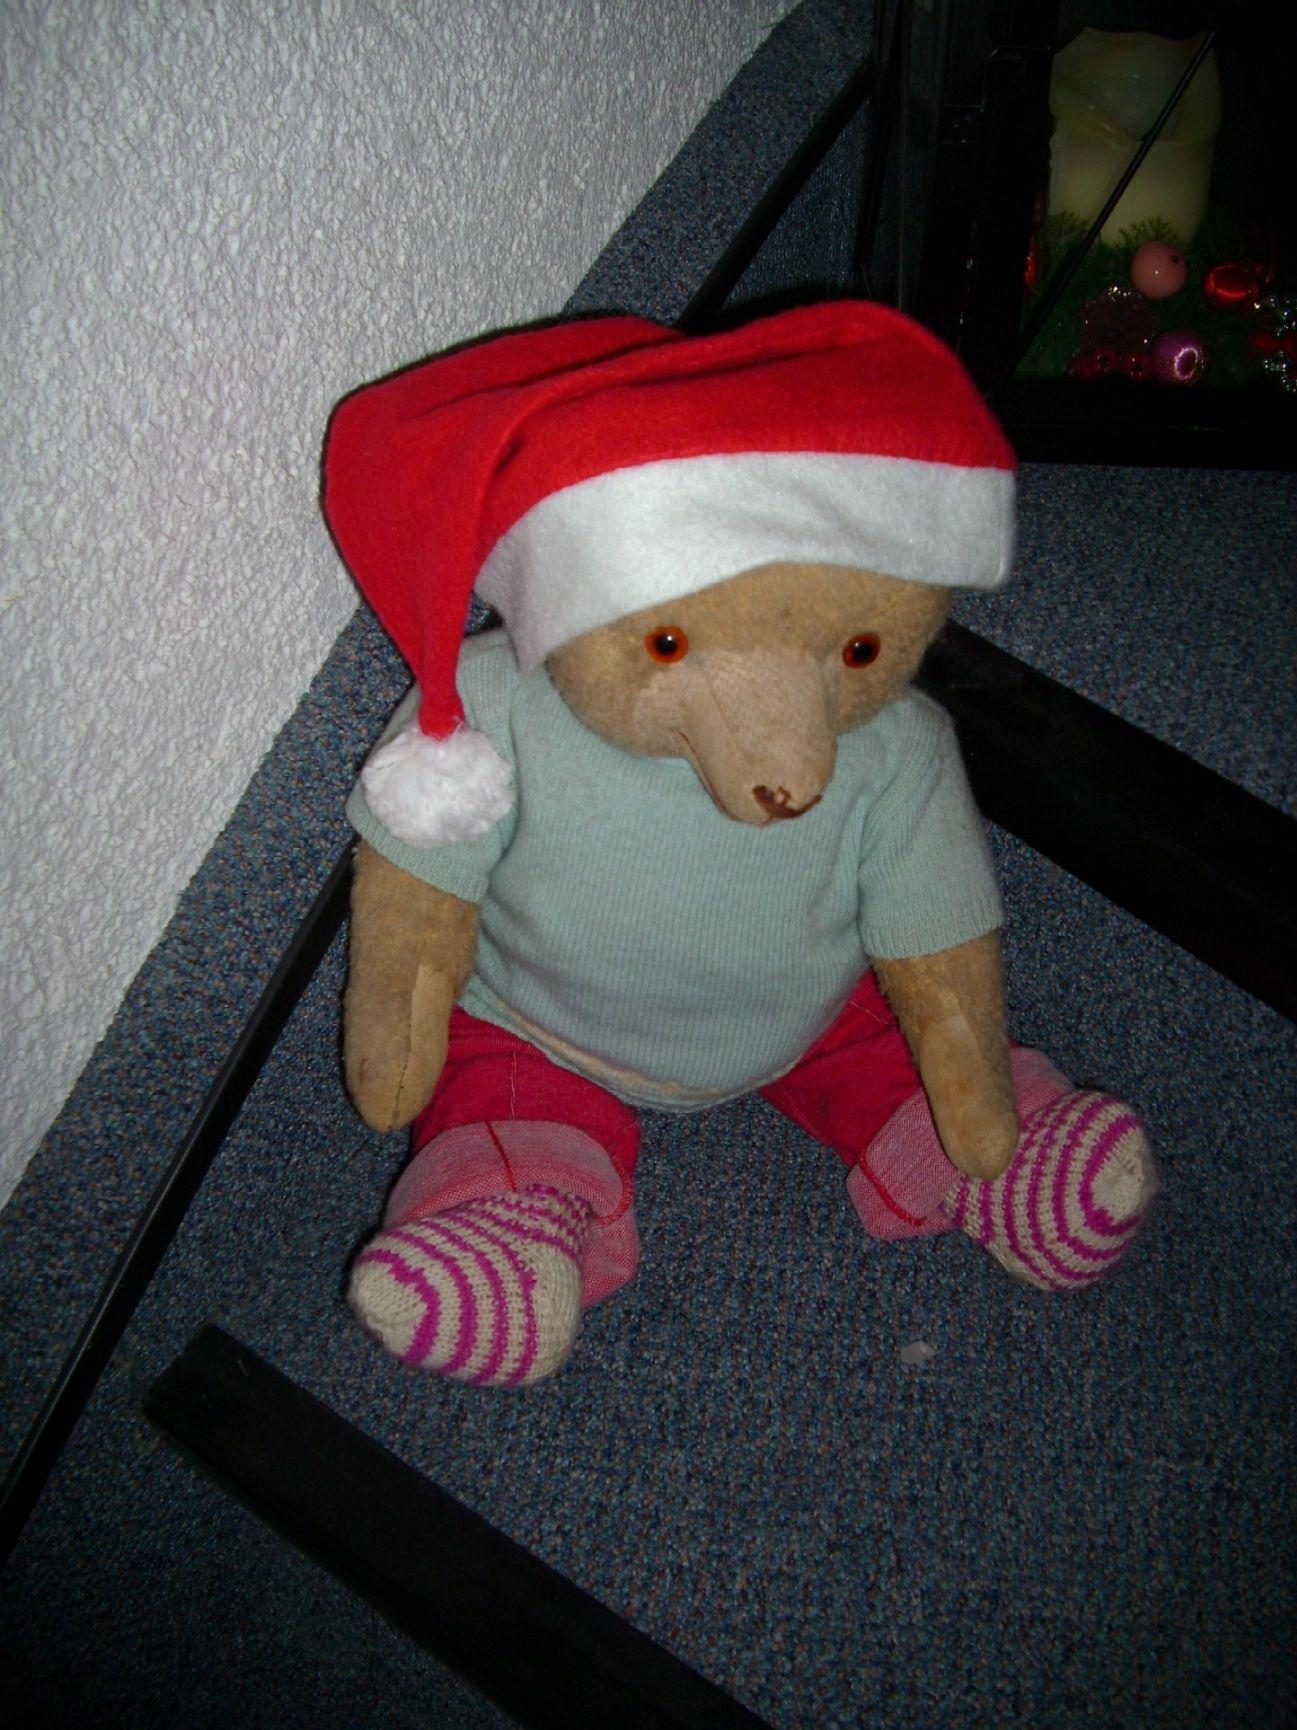 Heute, am 6. Dezember, ist auch der Bären-Nikolaus wieder aktuell.